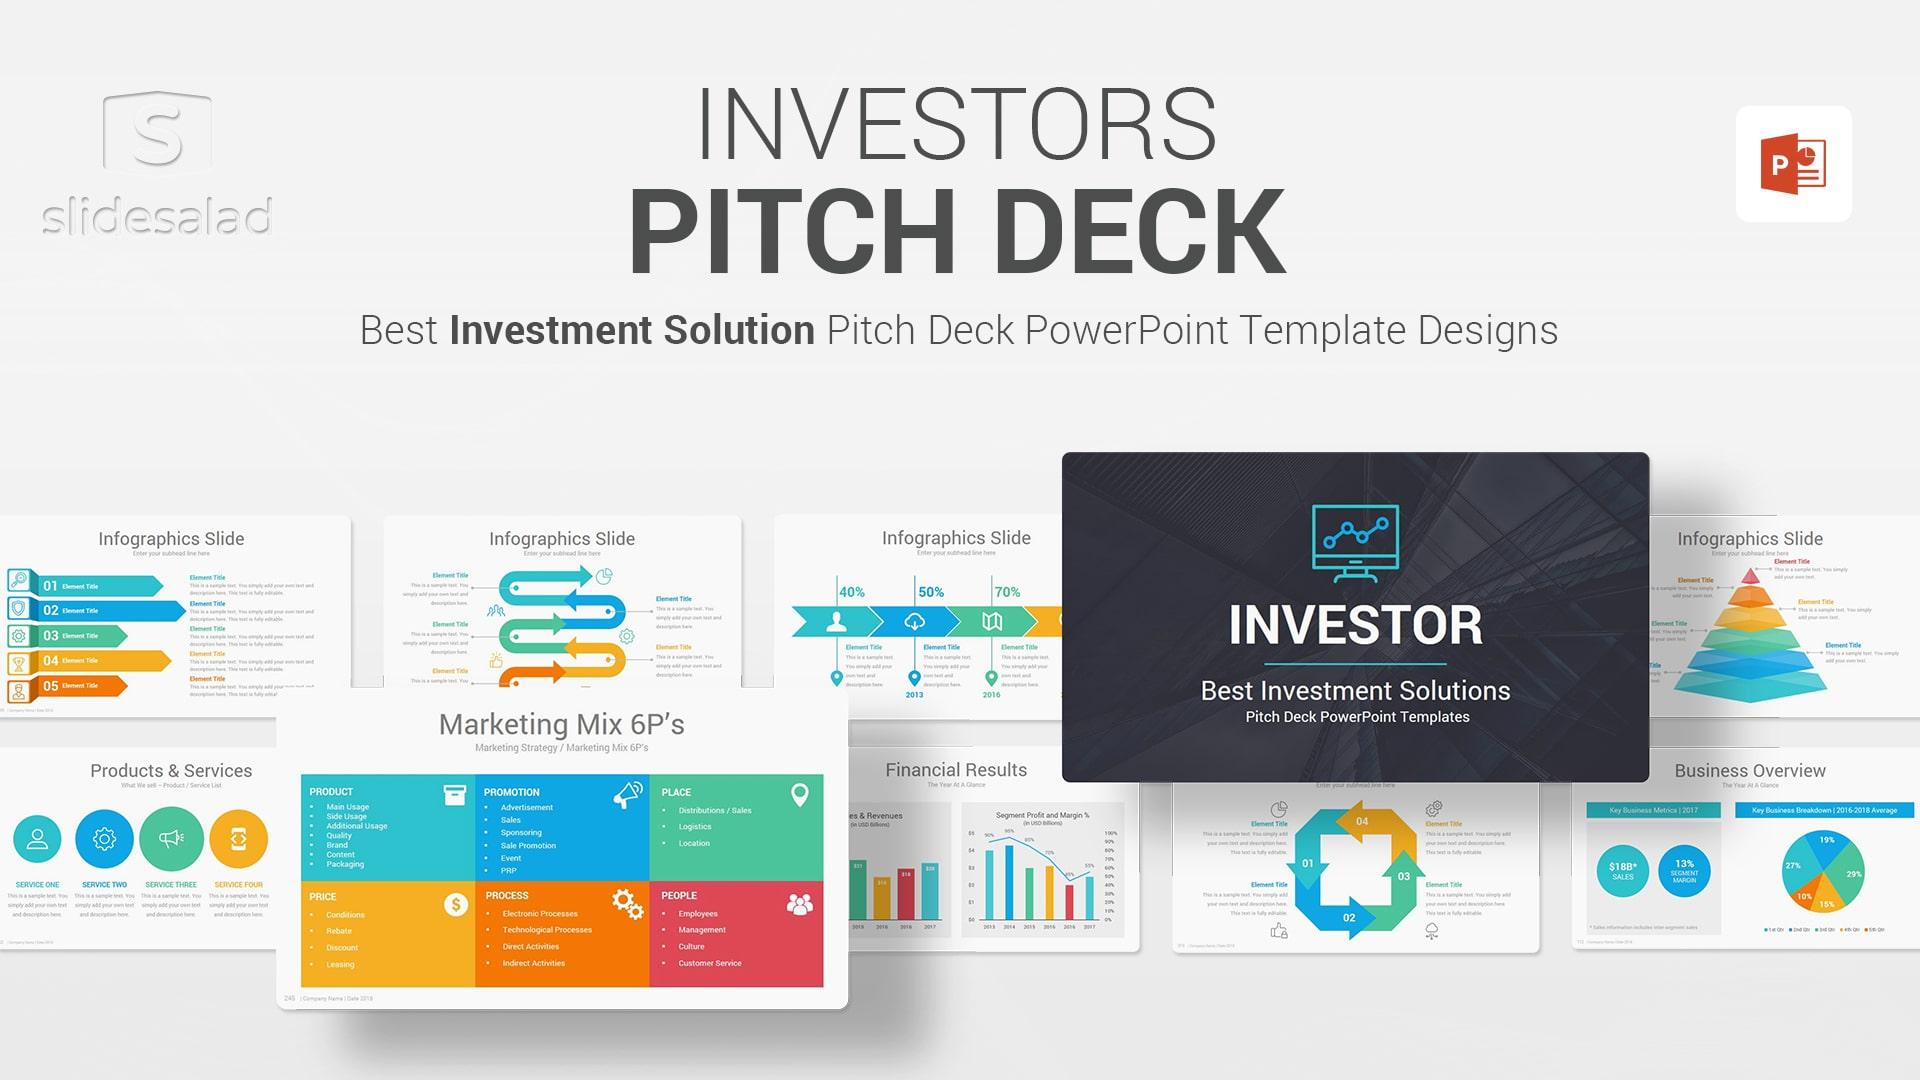 Best Investors Pitch Deck – Investment Proposal PowerPoint Templates - Best Investors Webinar PPT Templates